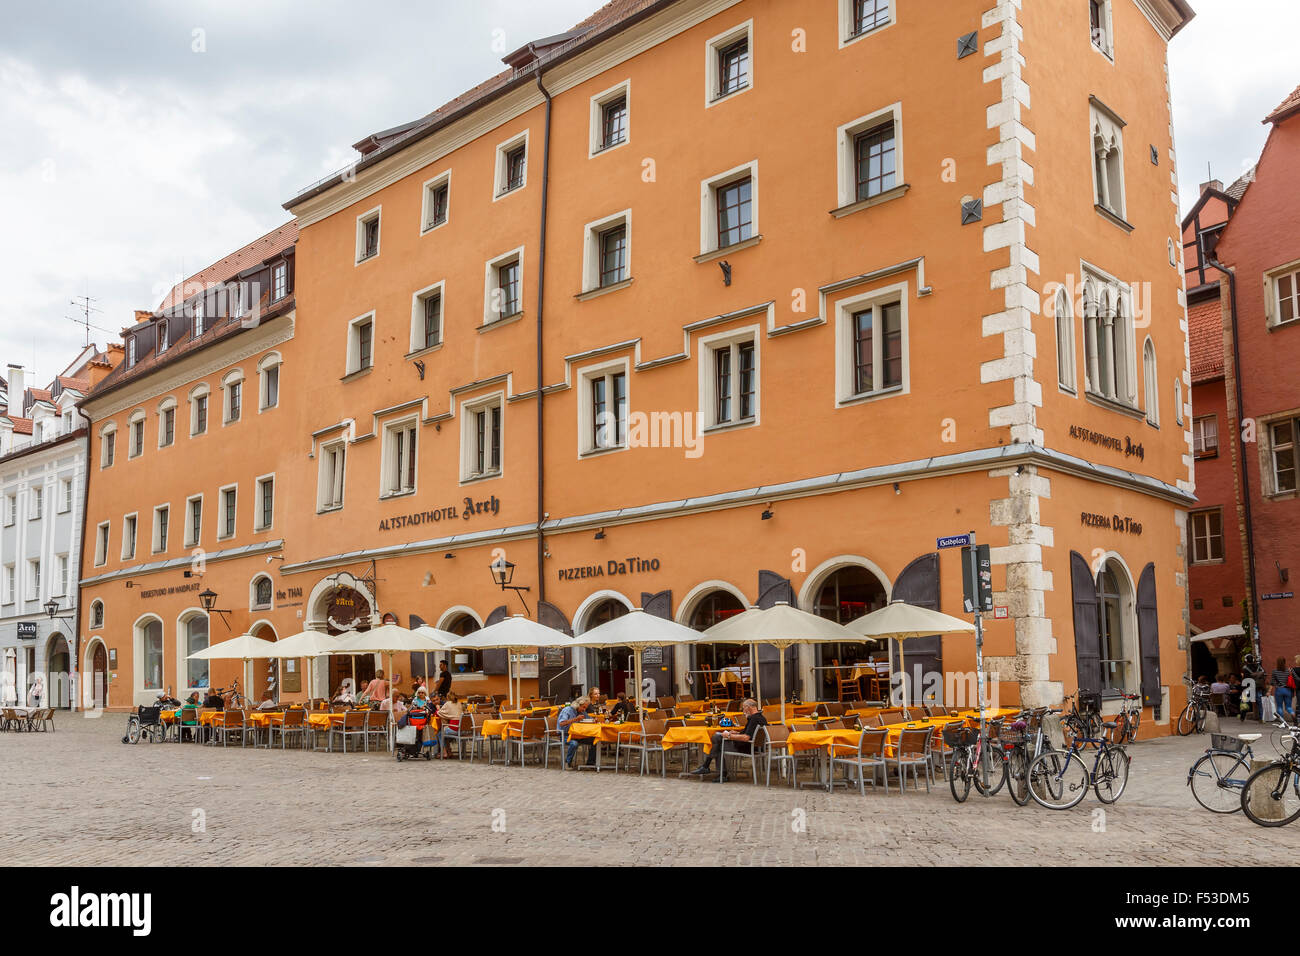 the altstadthotel and da tino pizzeria in regensburg bavaria stock photo 89201733 alamy. Black Bedroom Furniture Sets. Home Design Ideas